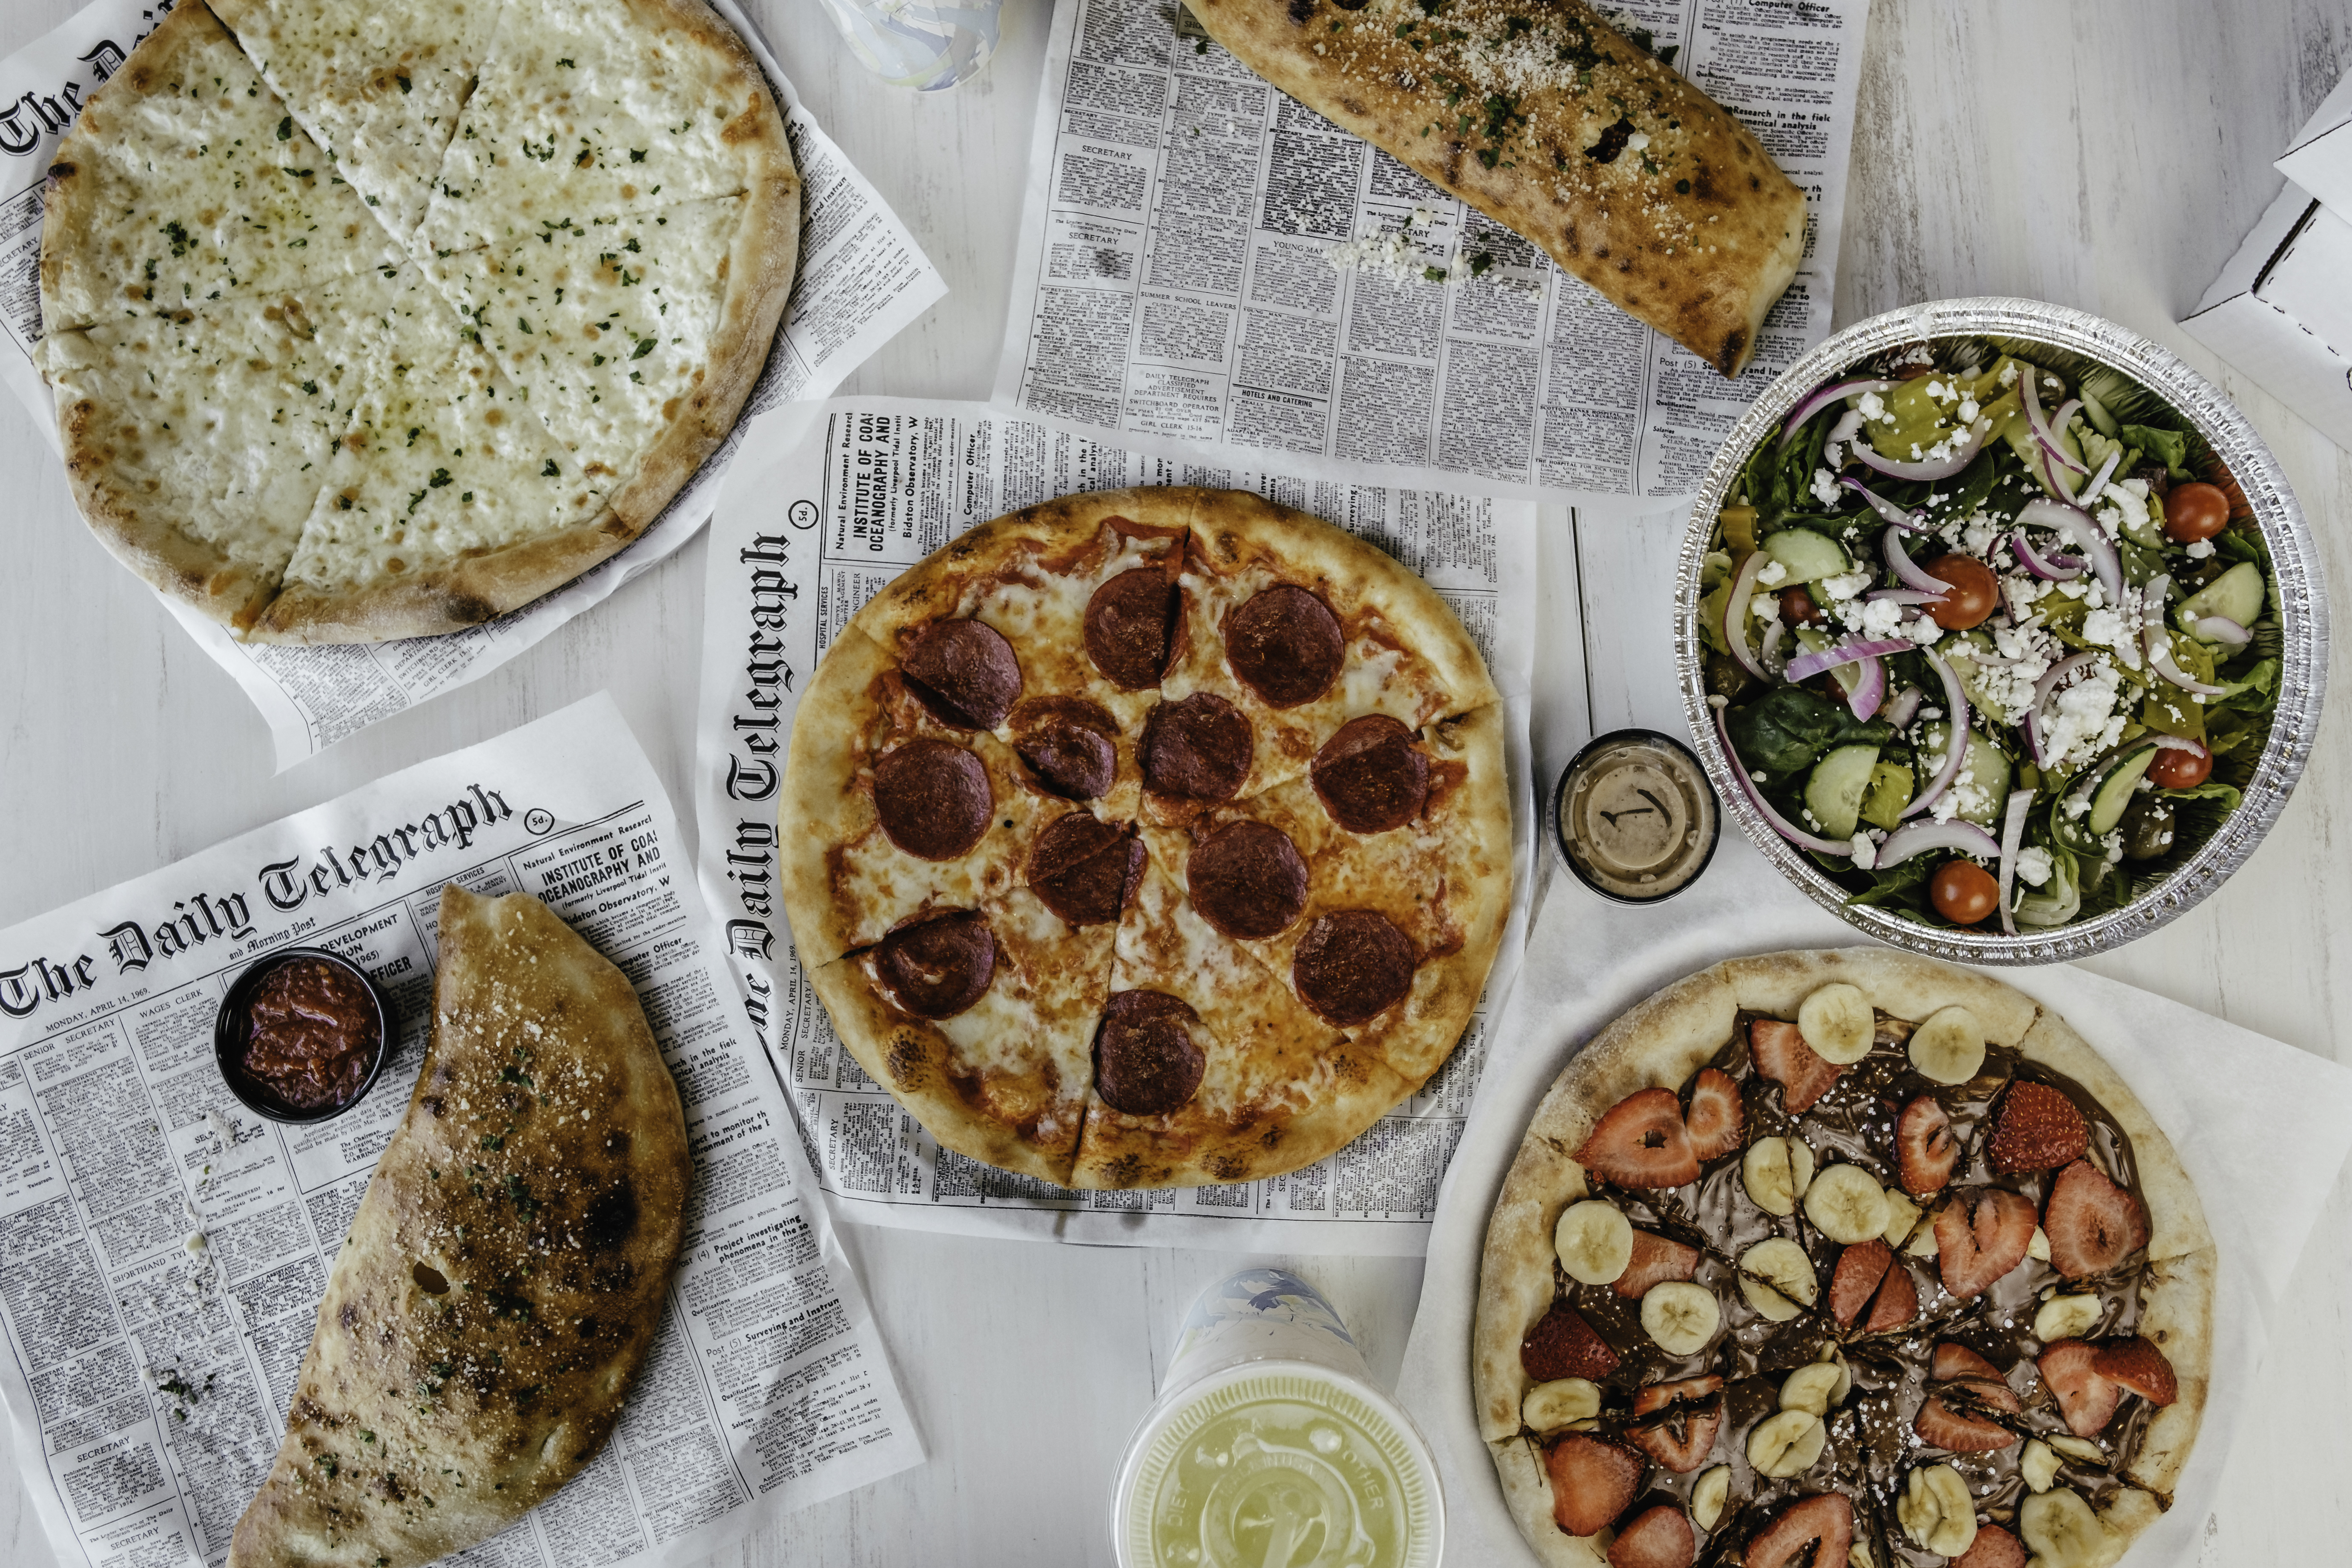 Pepperoni pizza, calzone, stromboli, Nutella pizza, salad, and Napolitana.